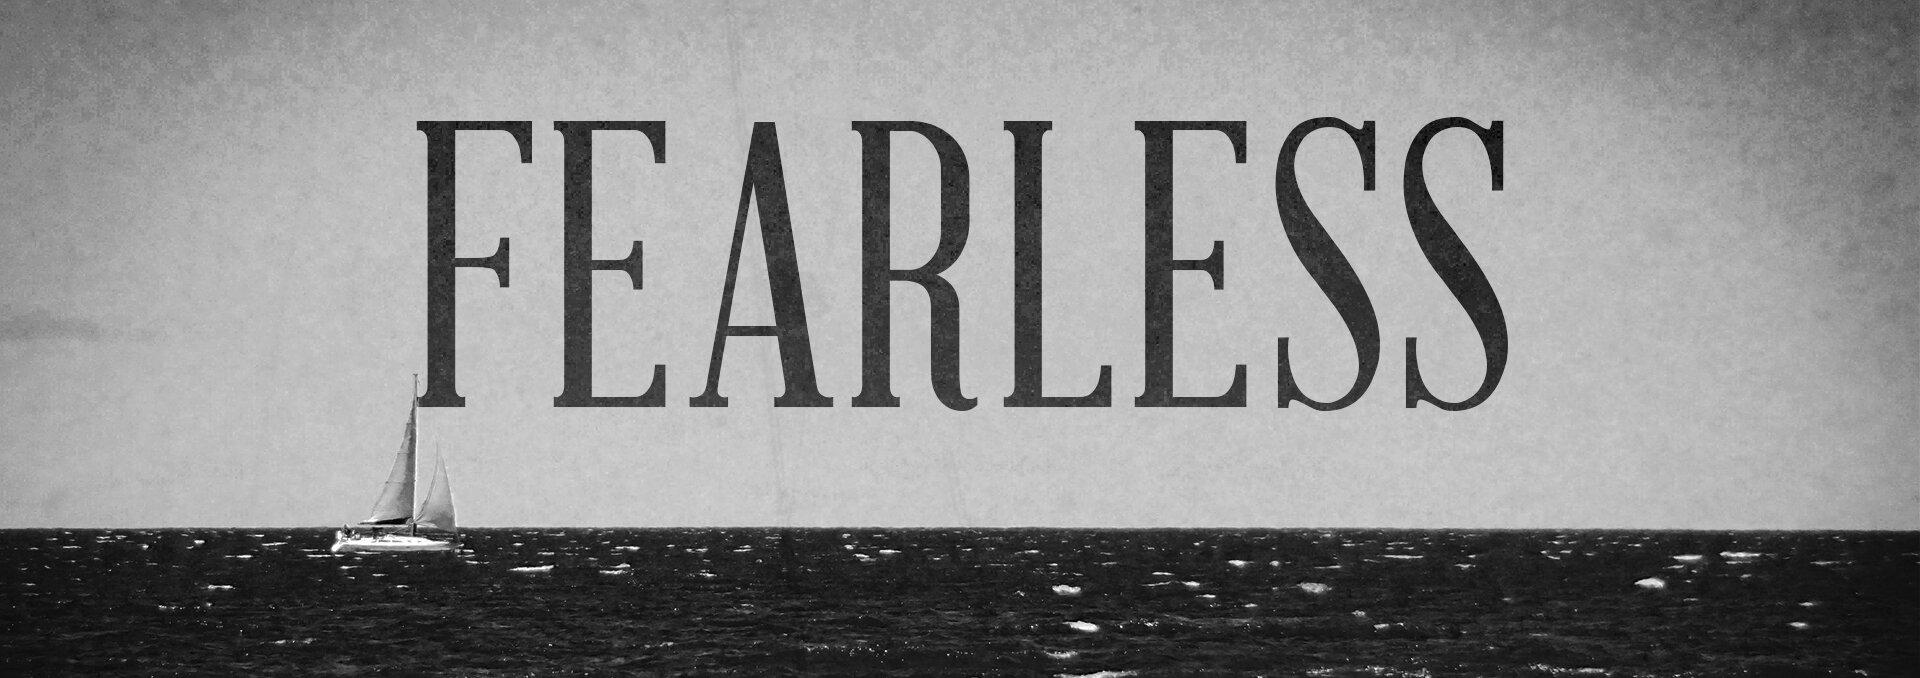 Fearless banner 2.jpg